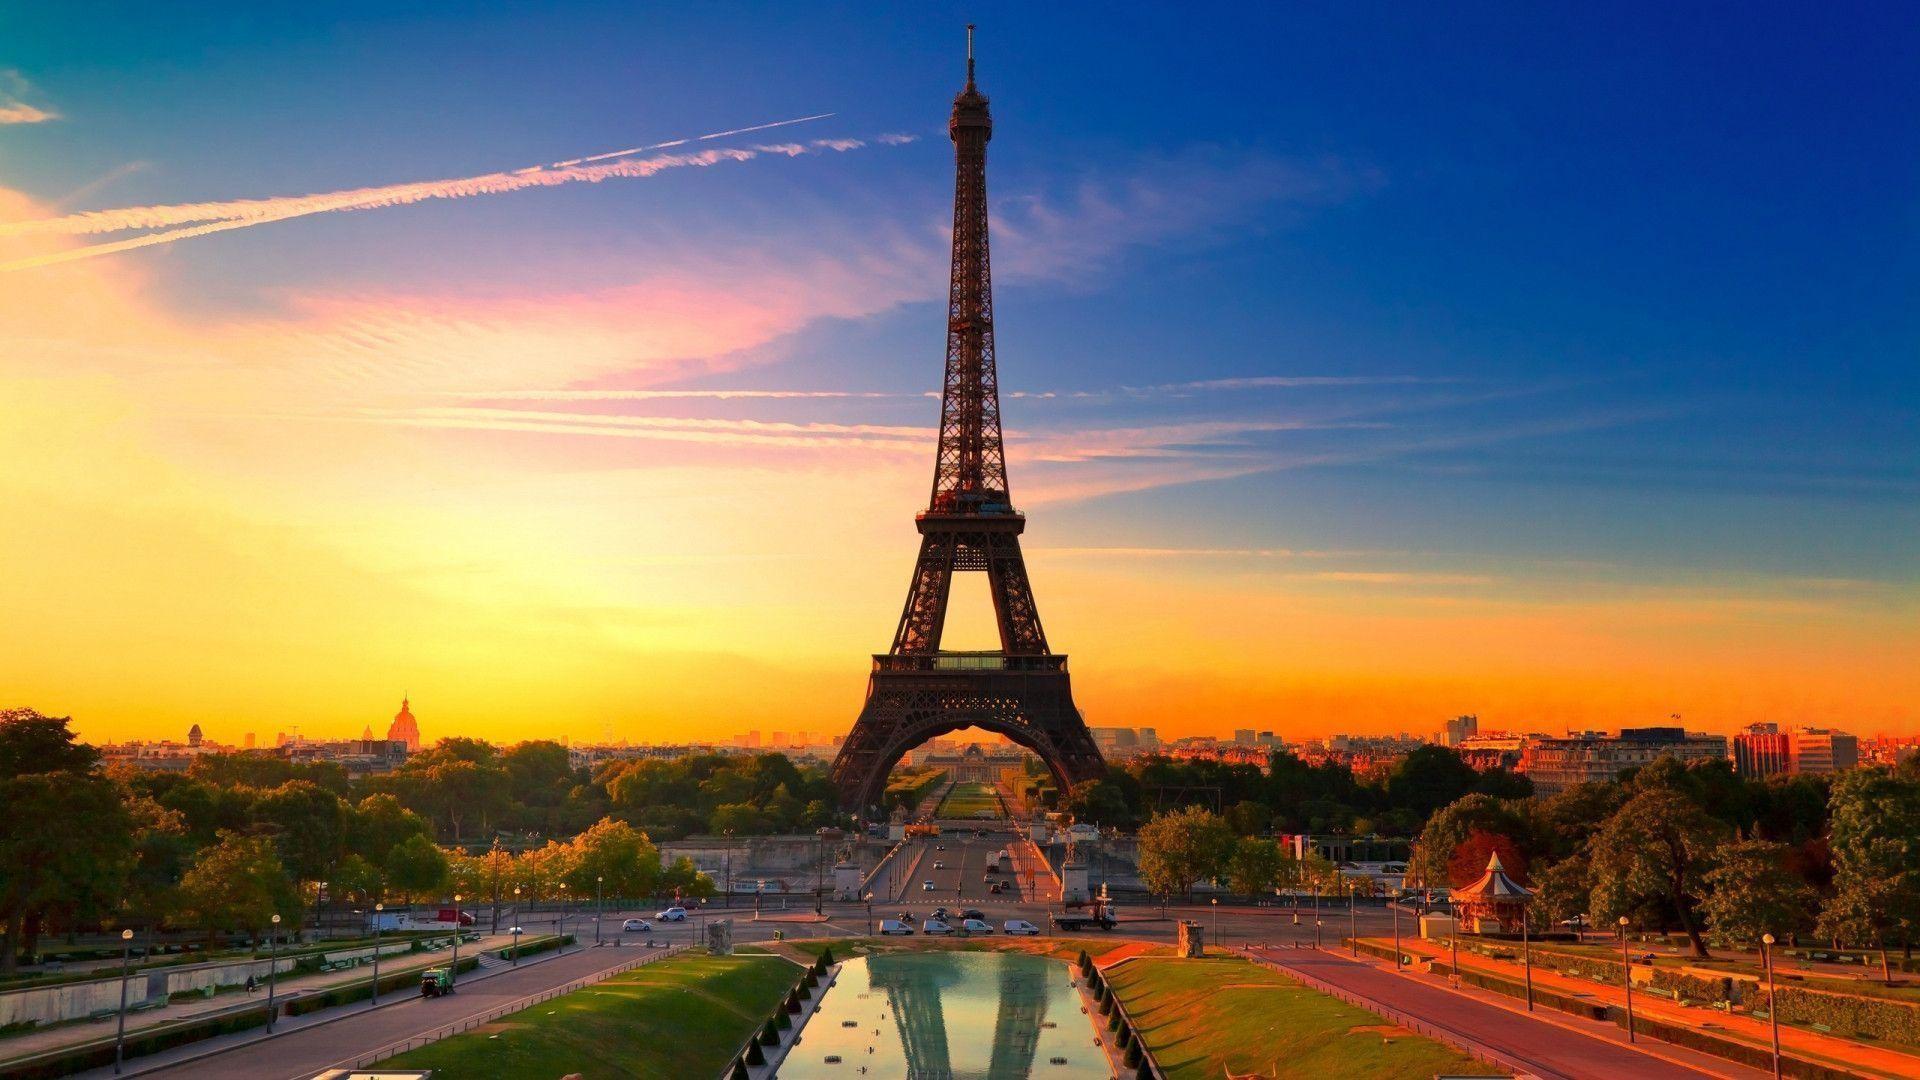 Seine River Cruise Guide - Riviera Travel Blog  |Paris